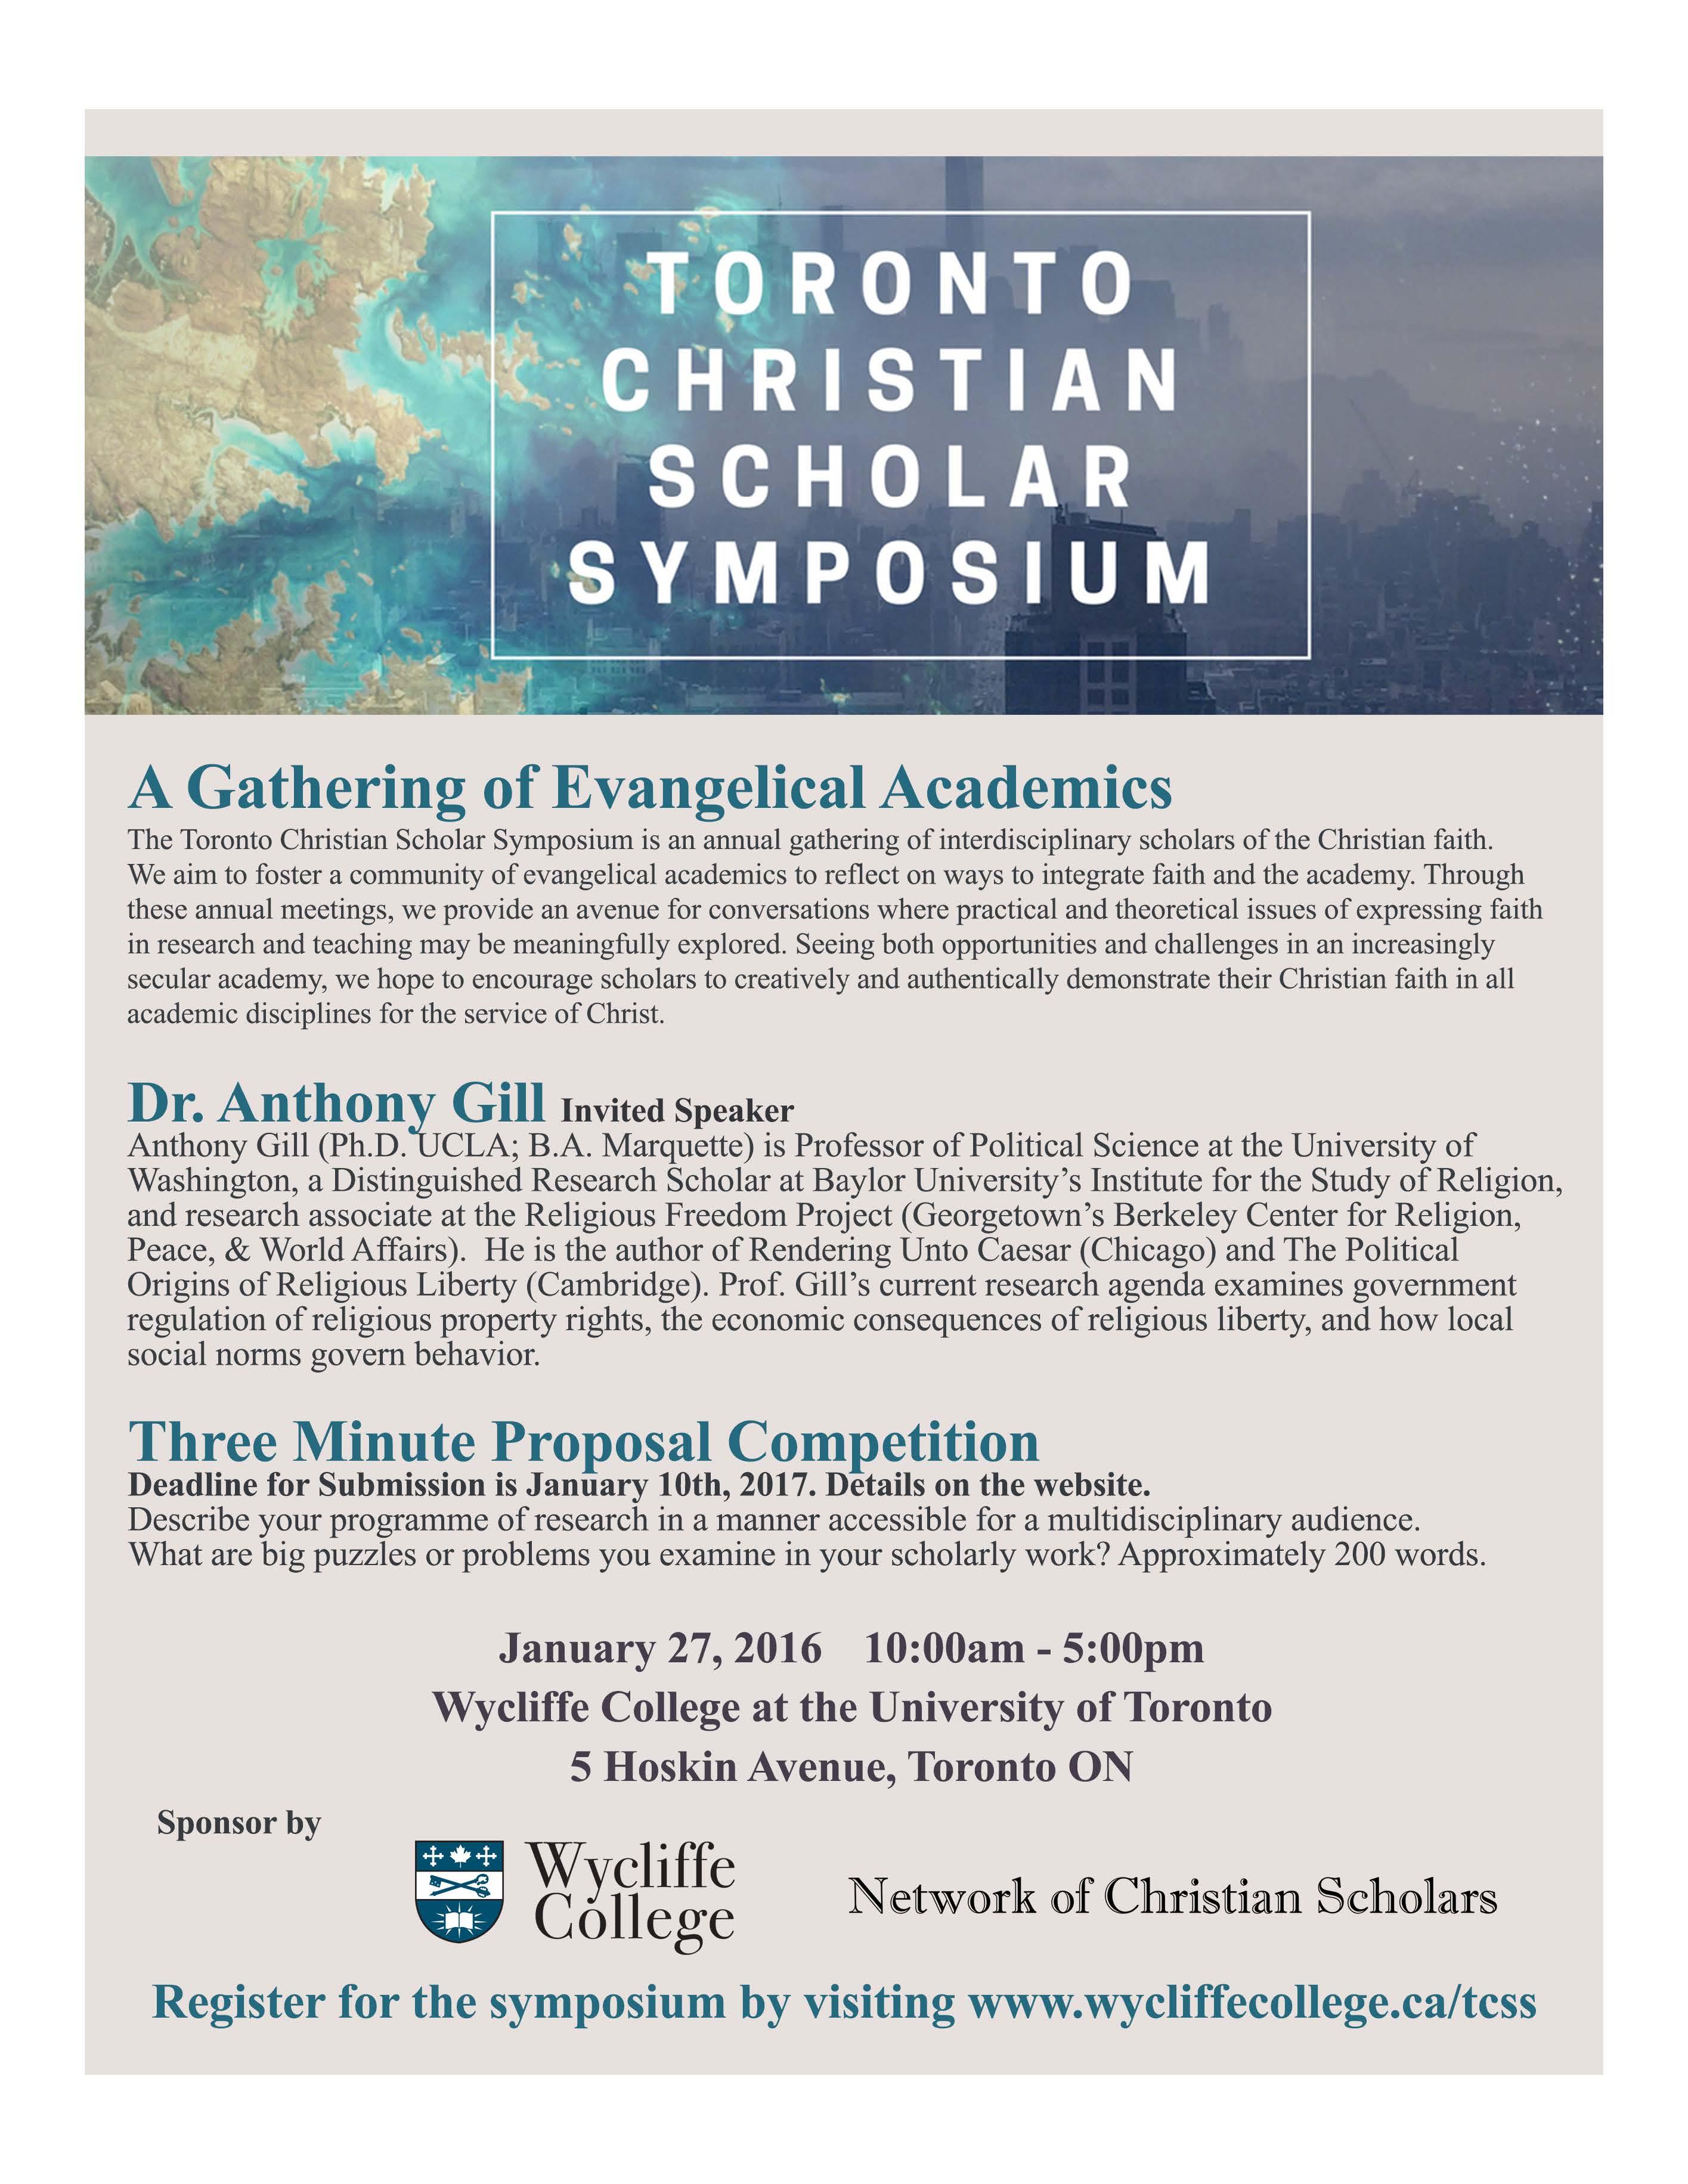 Toronto Christian Scholar Symposium 2017